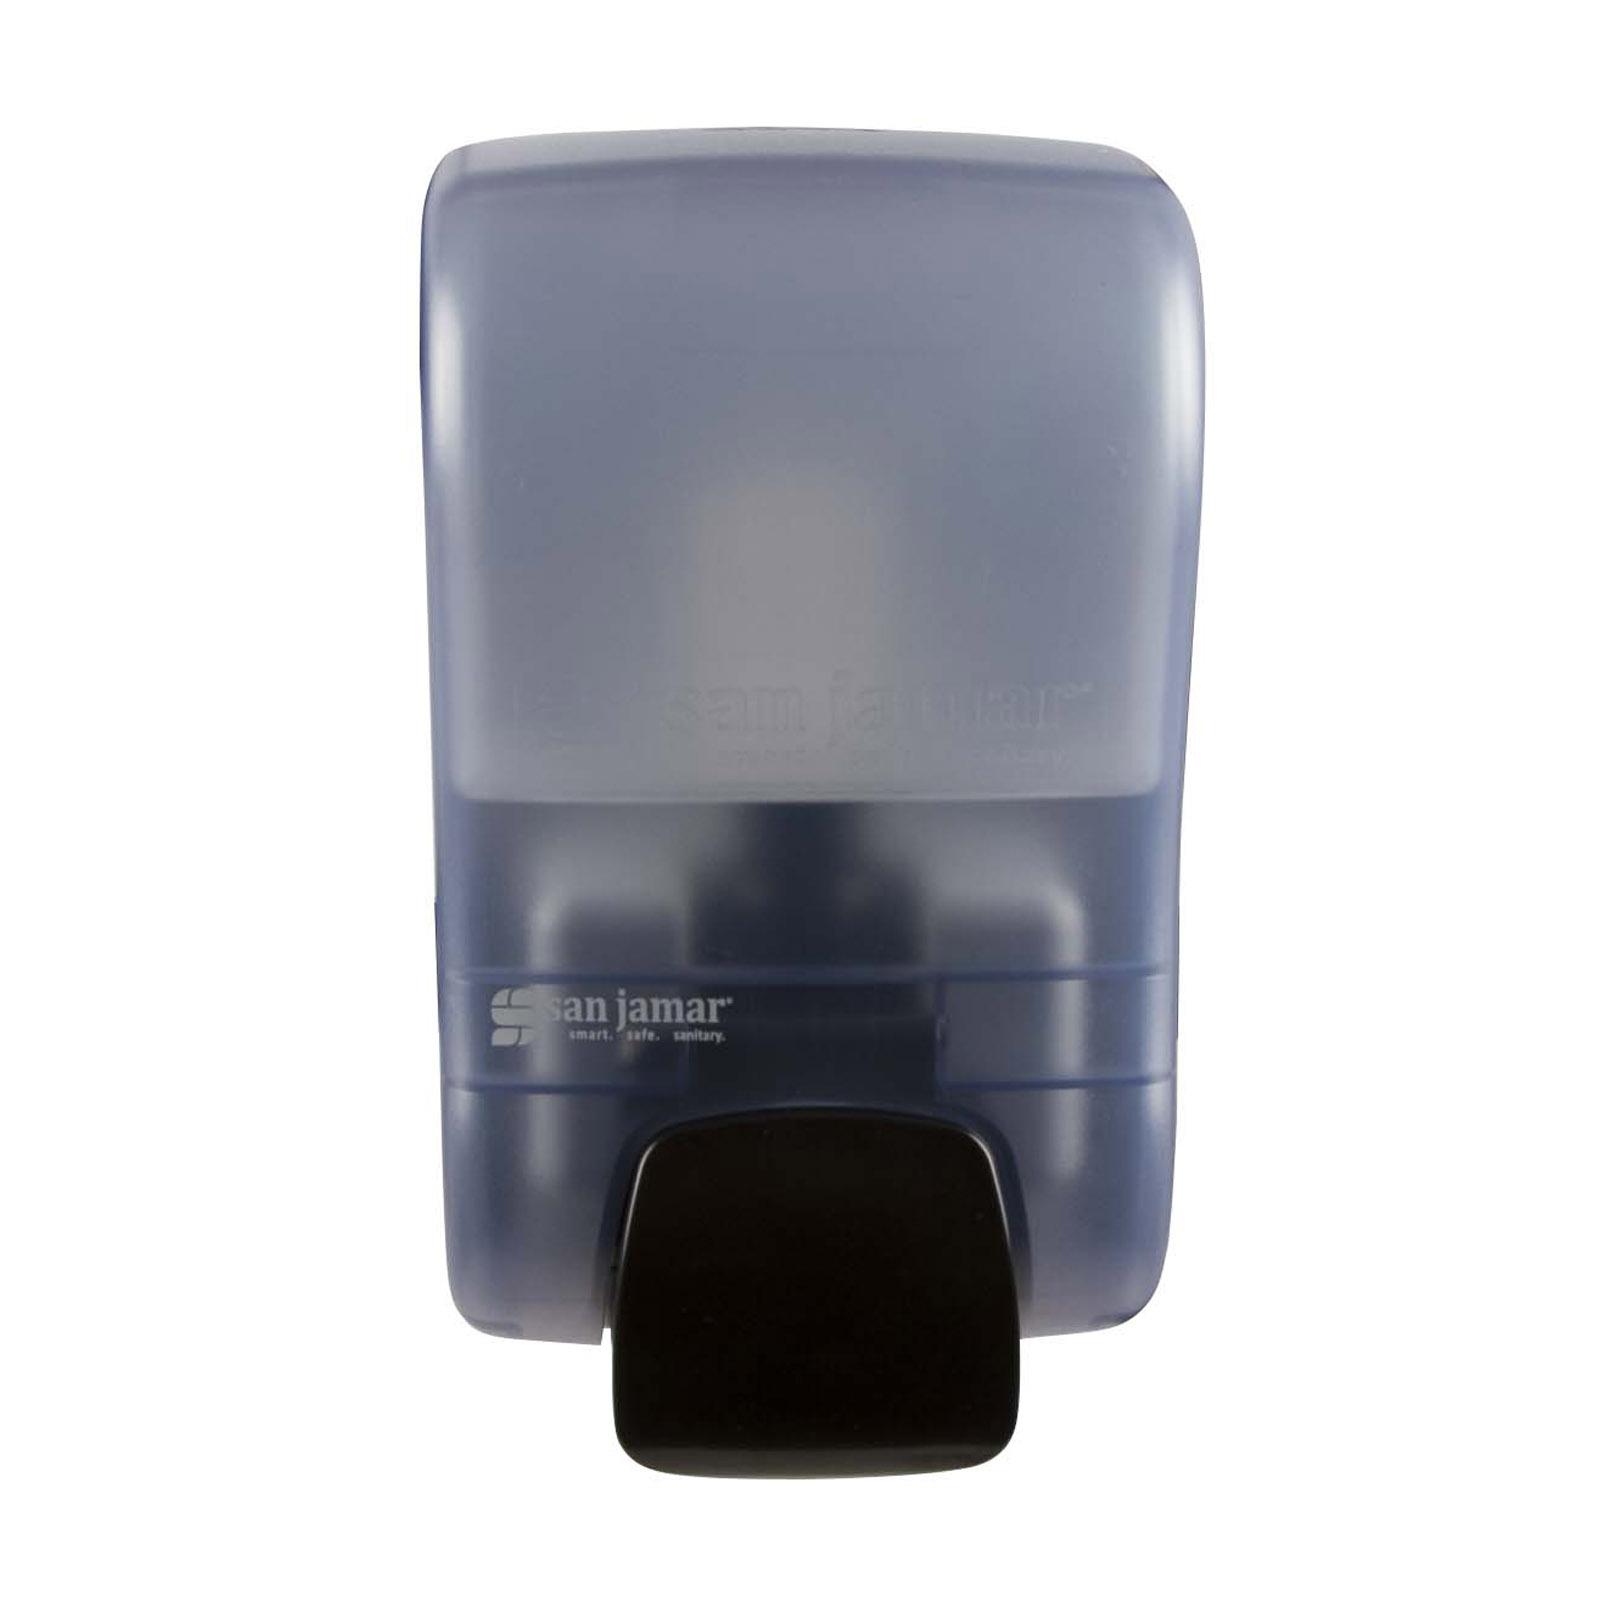 San Jamar S900TBL hand soap / sanitizer dispenser